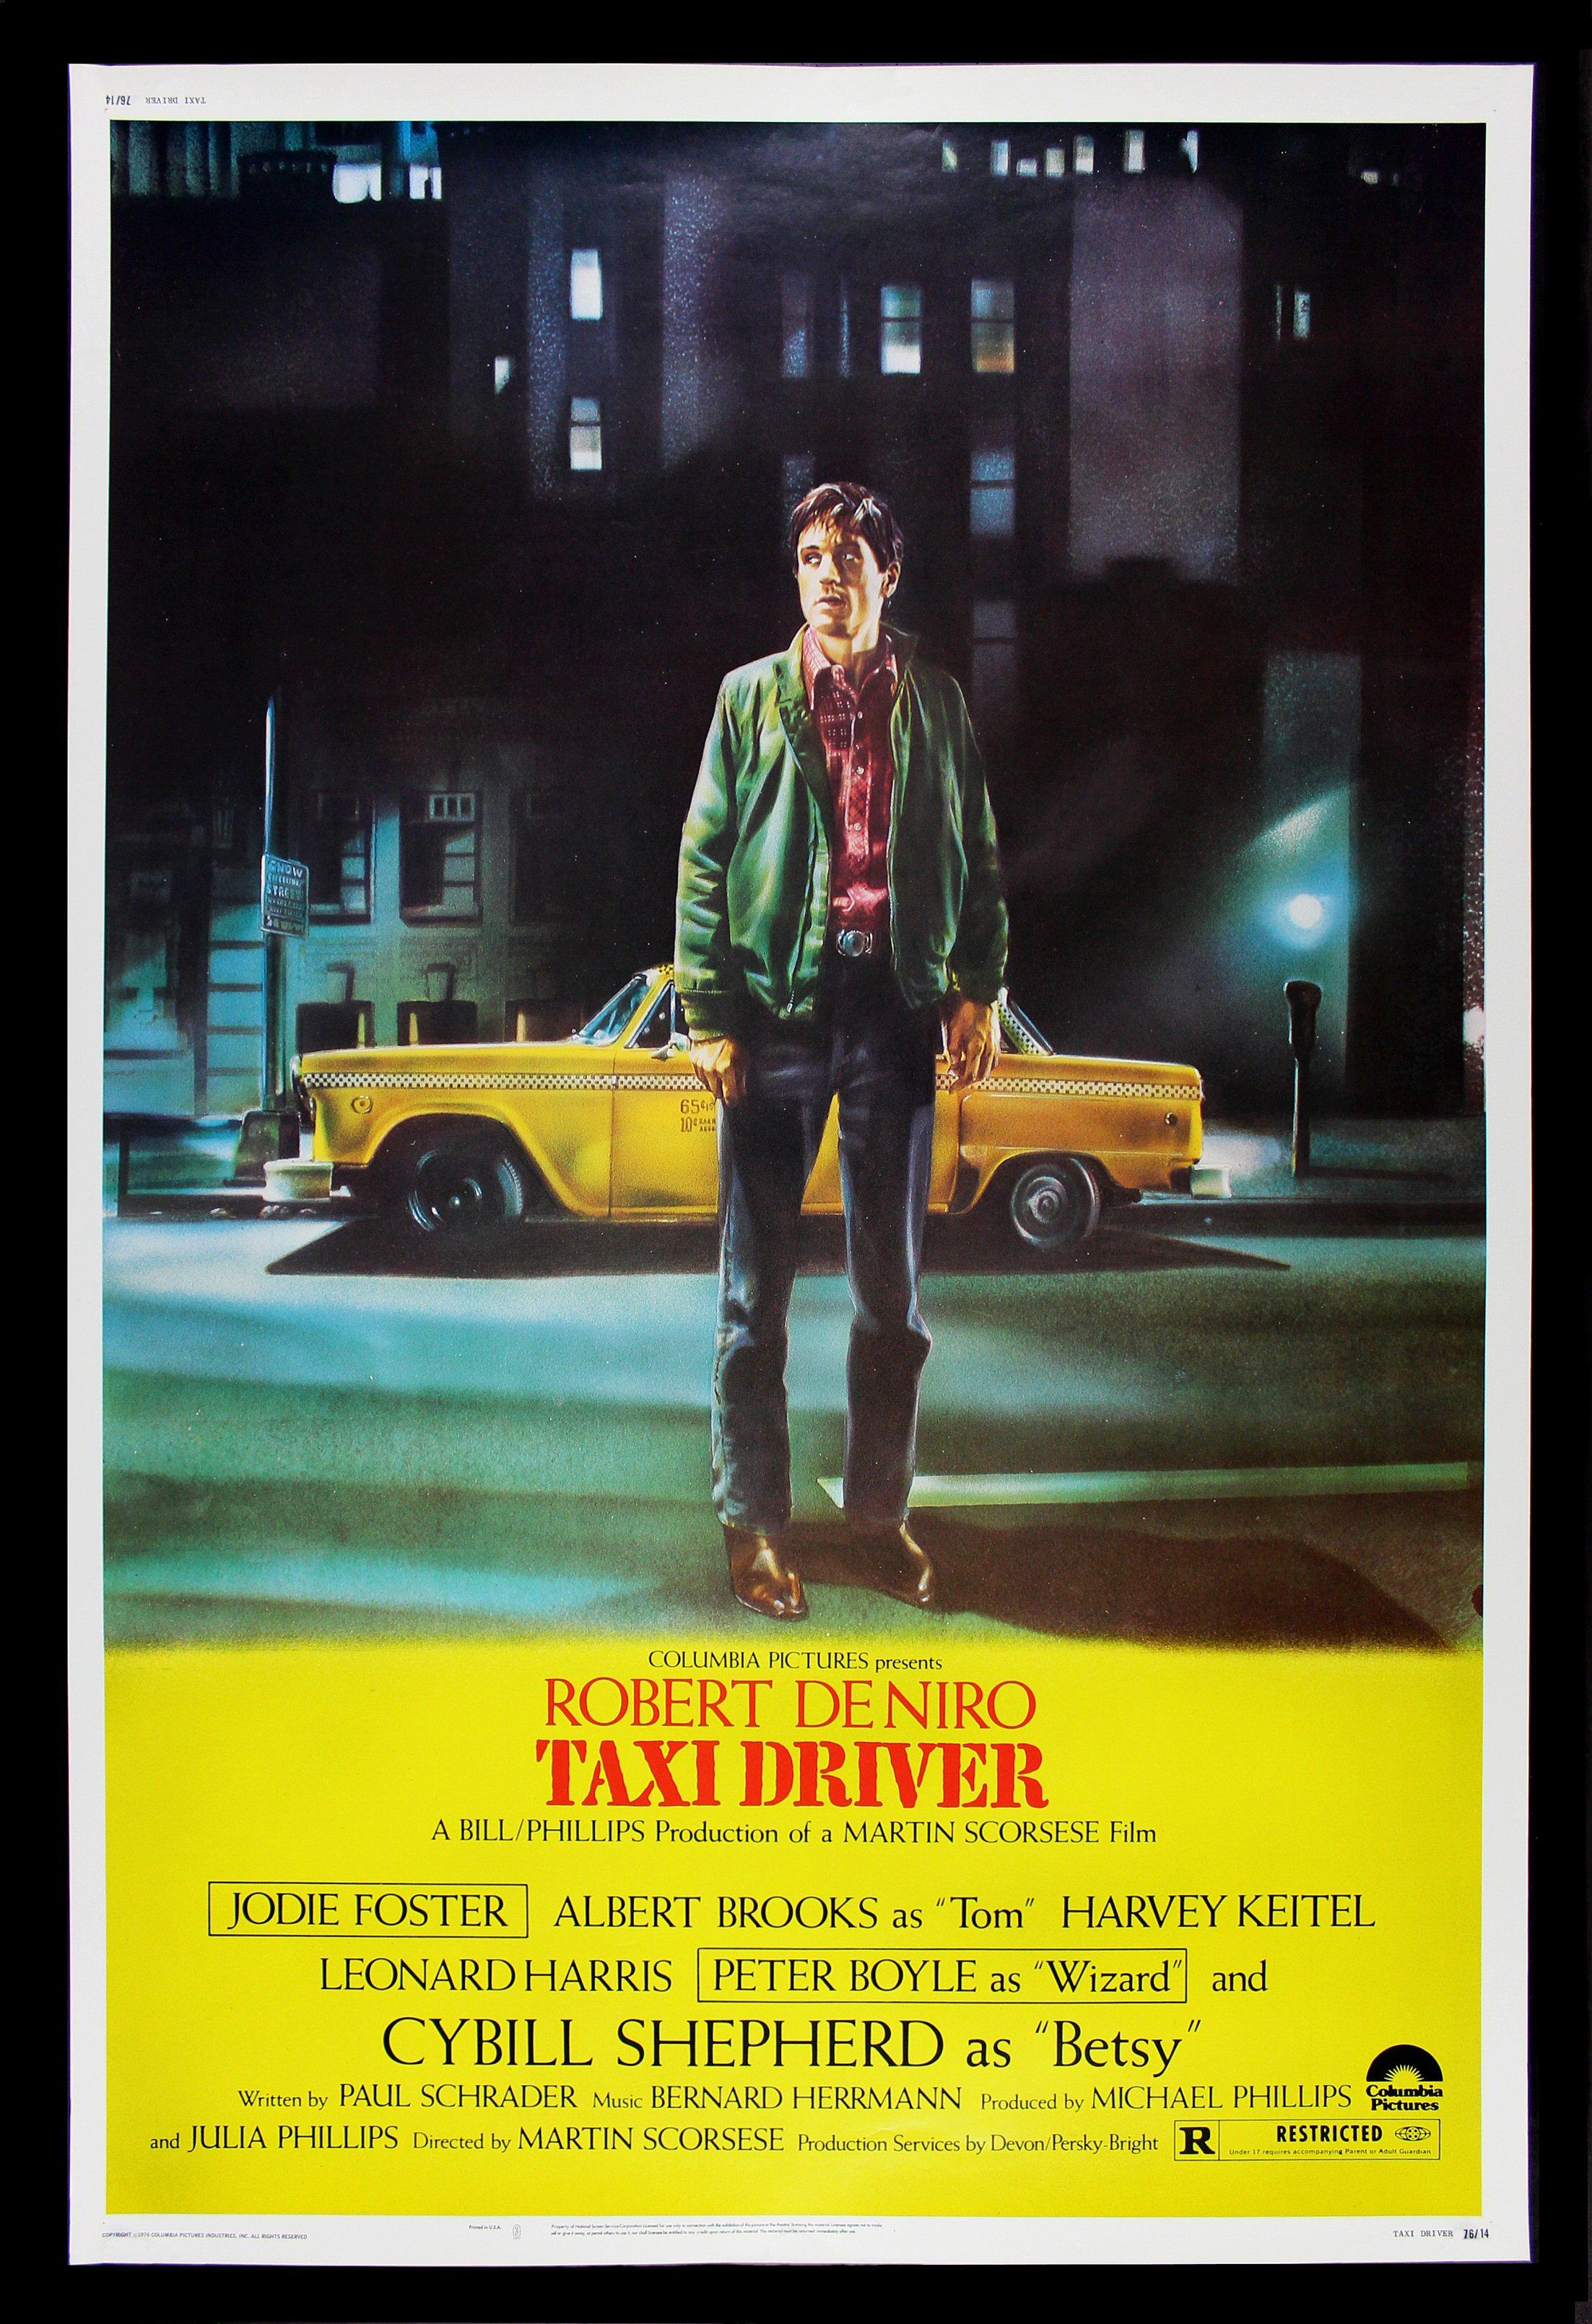 TAXI DRIVER * CineMasterpieces HUGE 40x60 ORIGINAL MOVIE ...